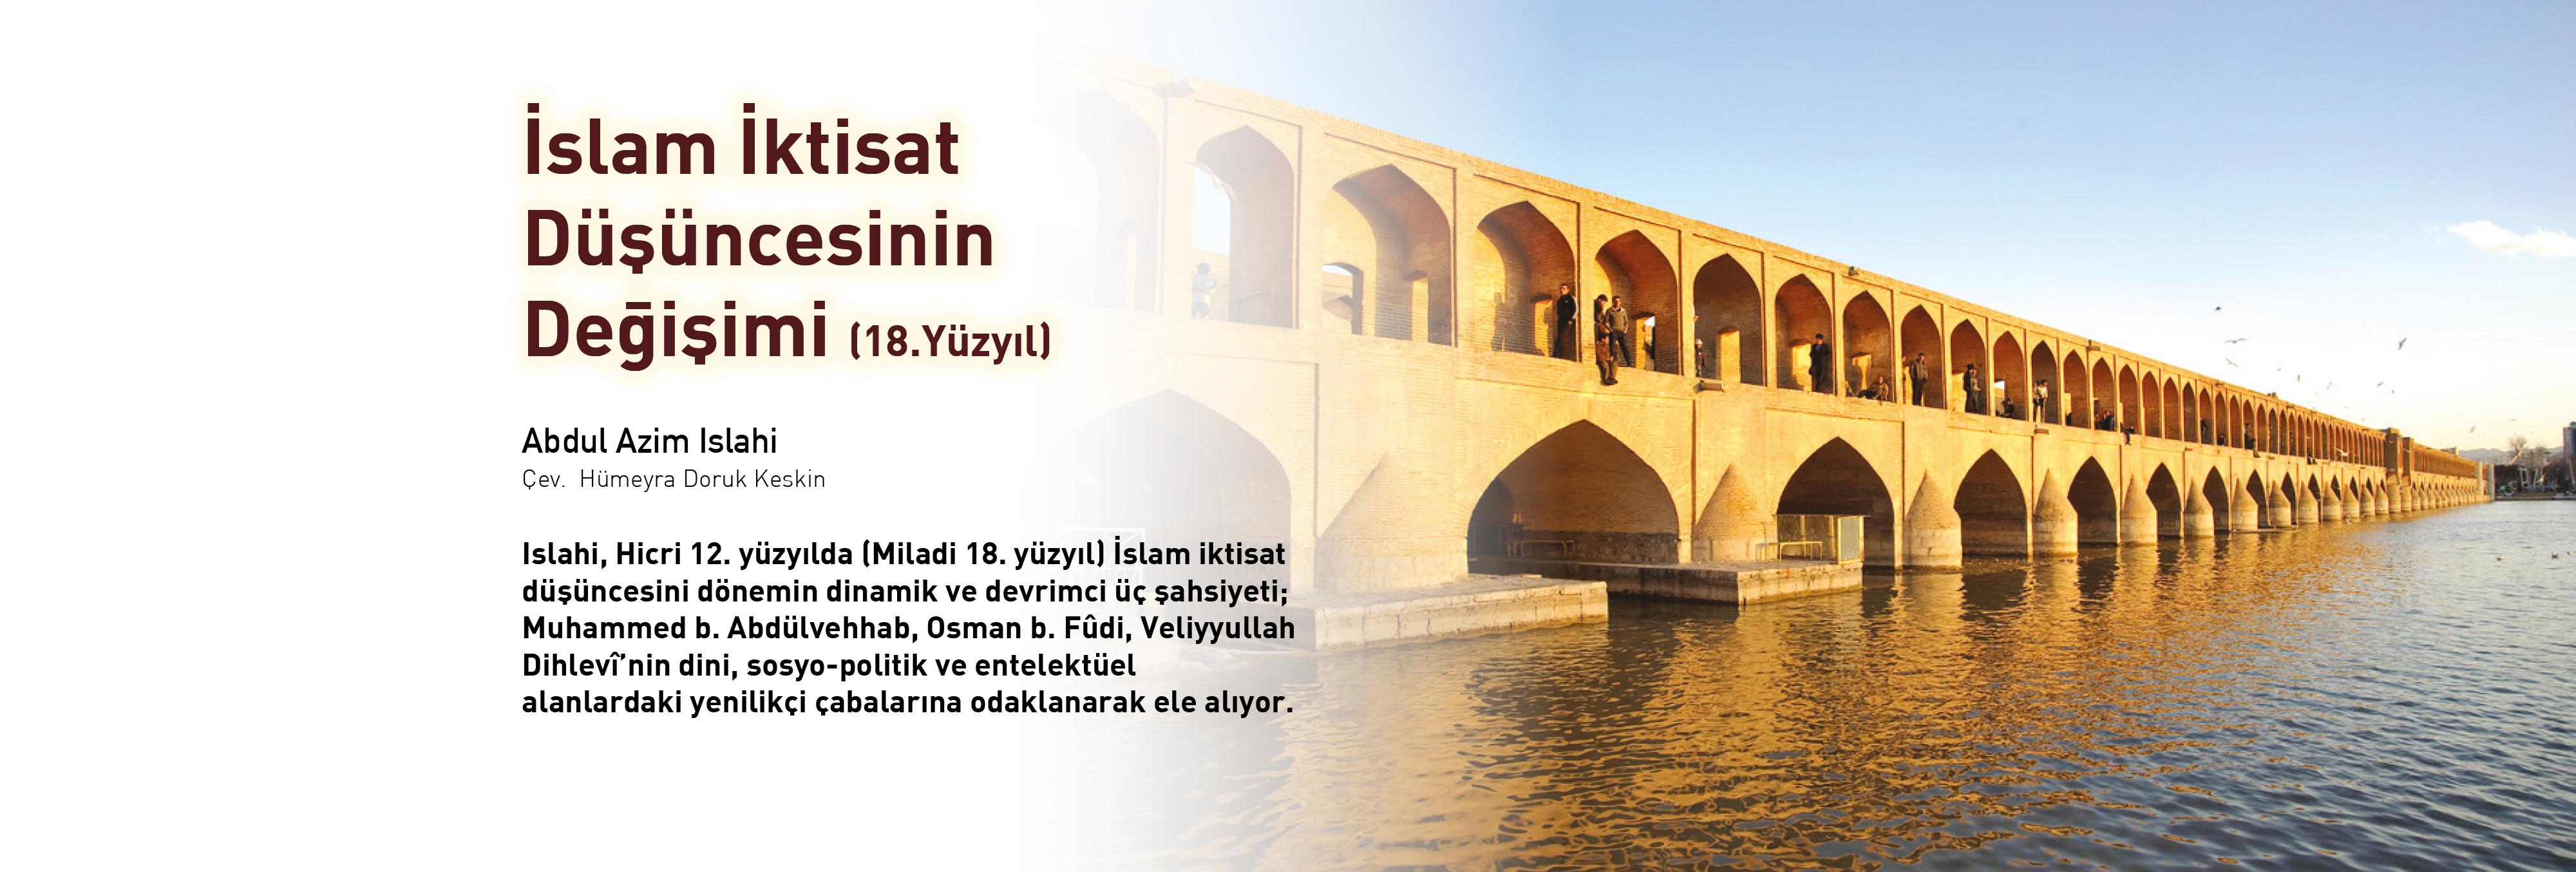 http://iktisatyayinlari.com/content/1-home/03.jpg